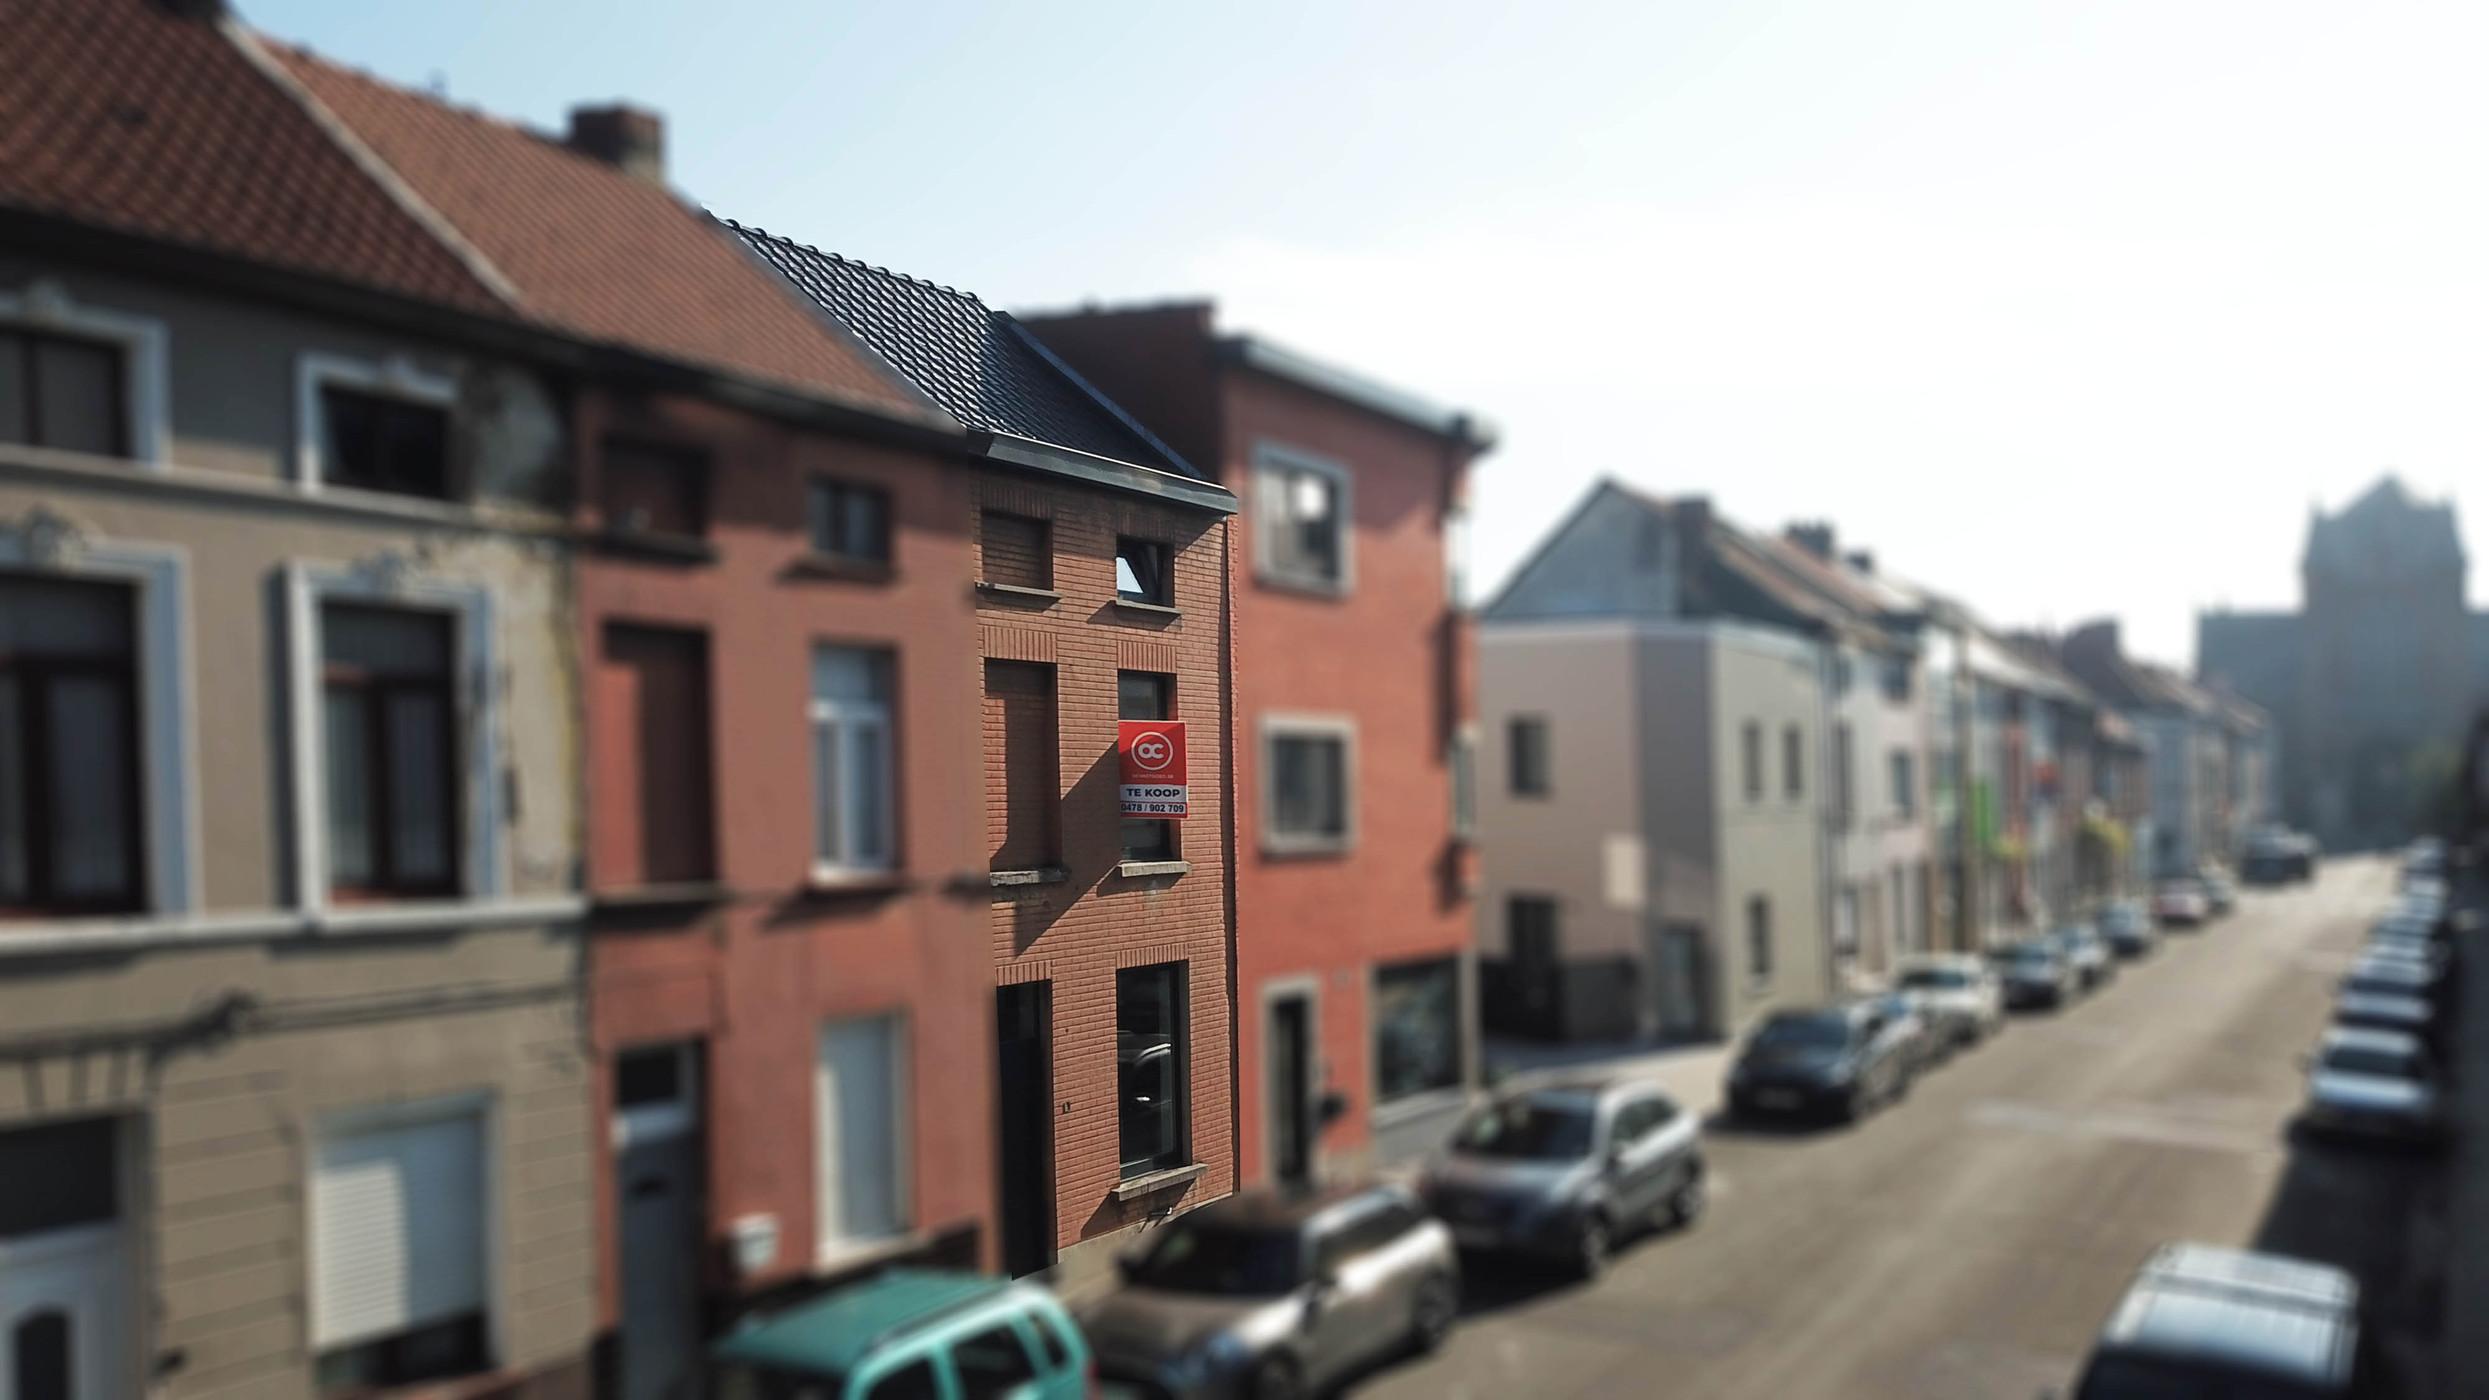 Gezellige, verder af te werken, woning te koop op goede ligging in Gent.